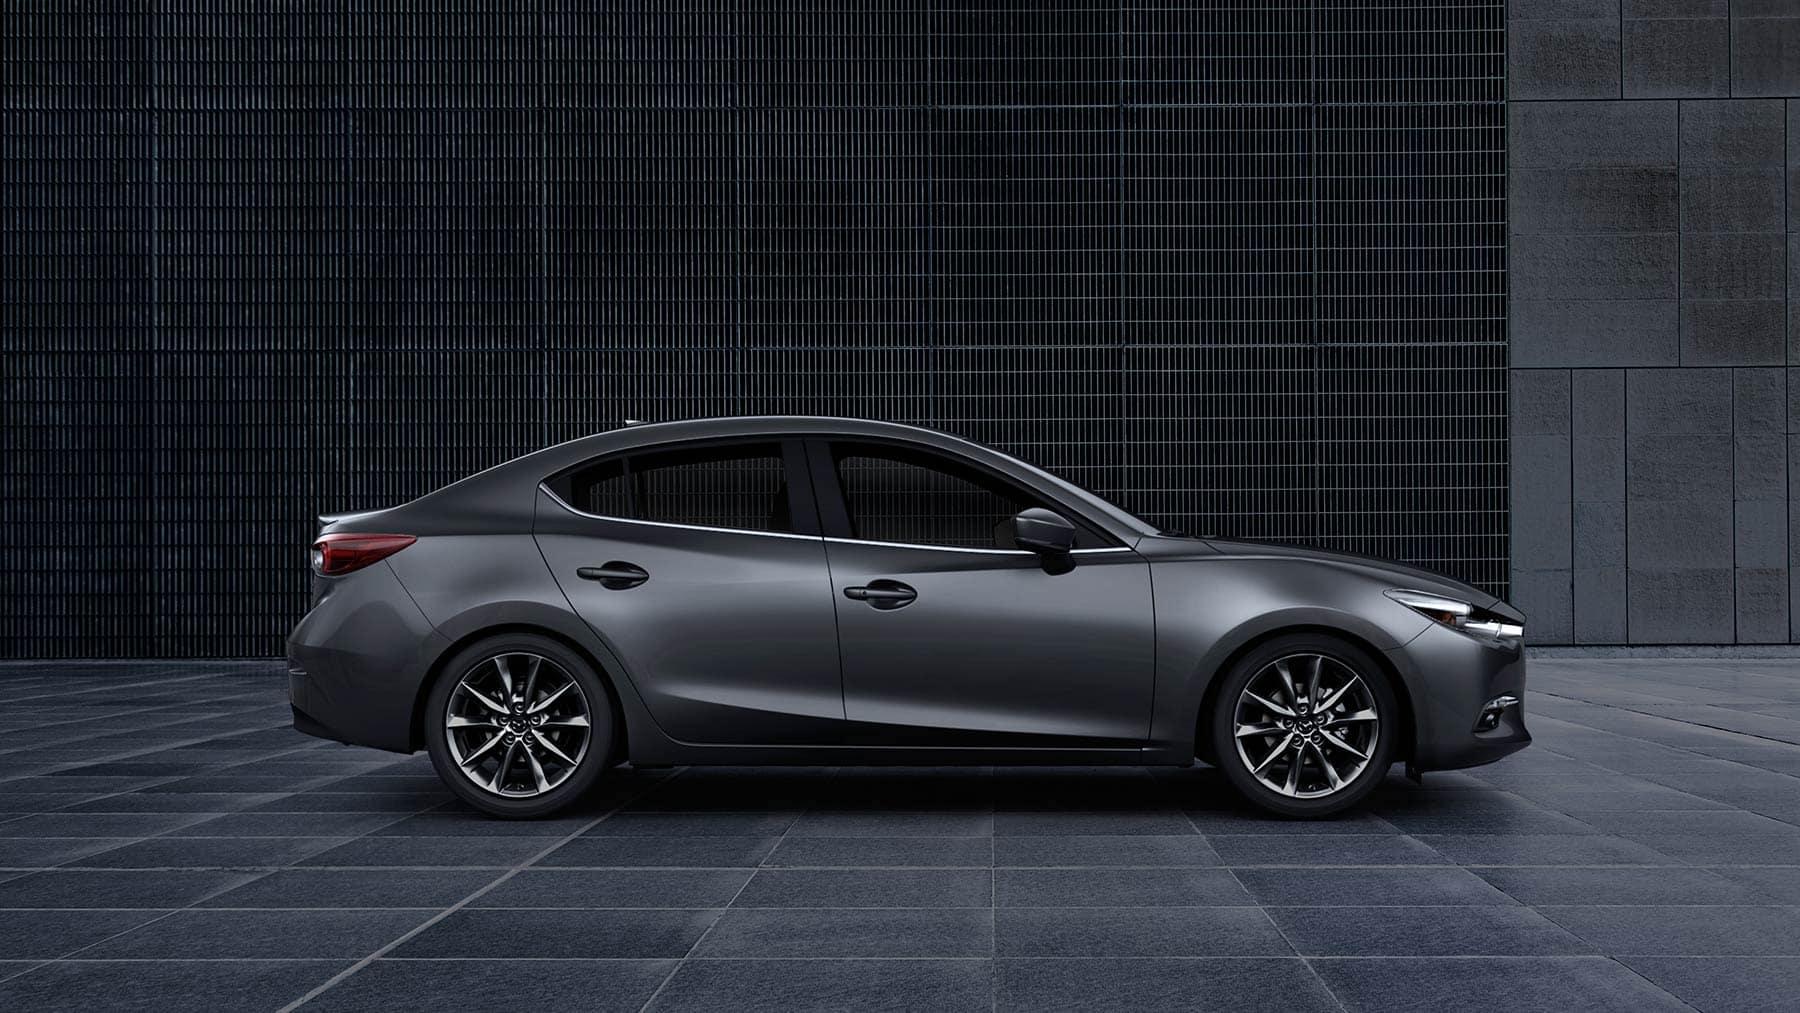 2018 Mazda3 Interior